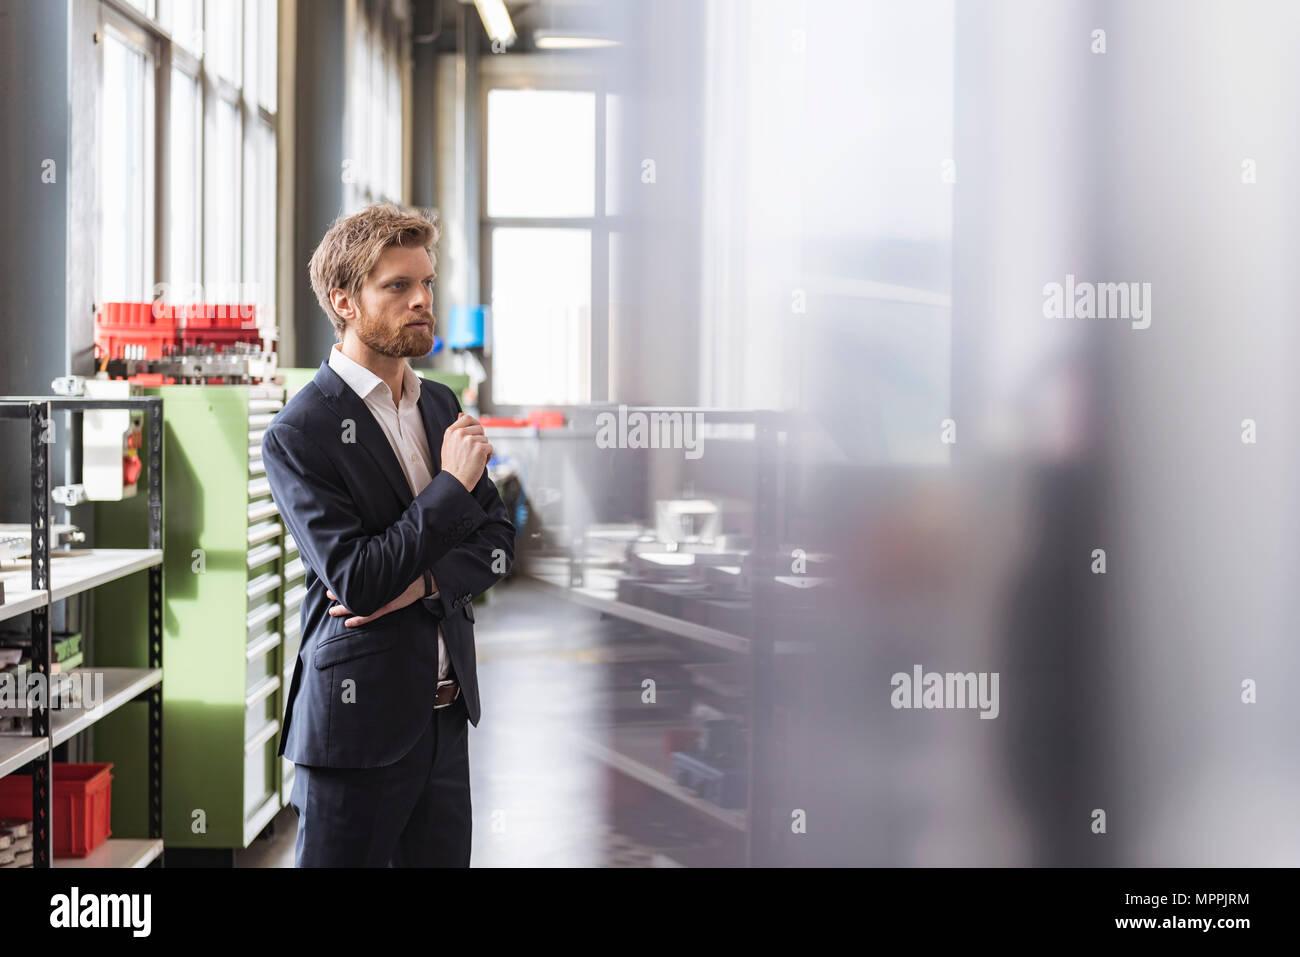 Geschäftsmann in der modernen Fabrik starrte Stockbild